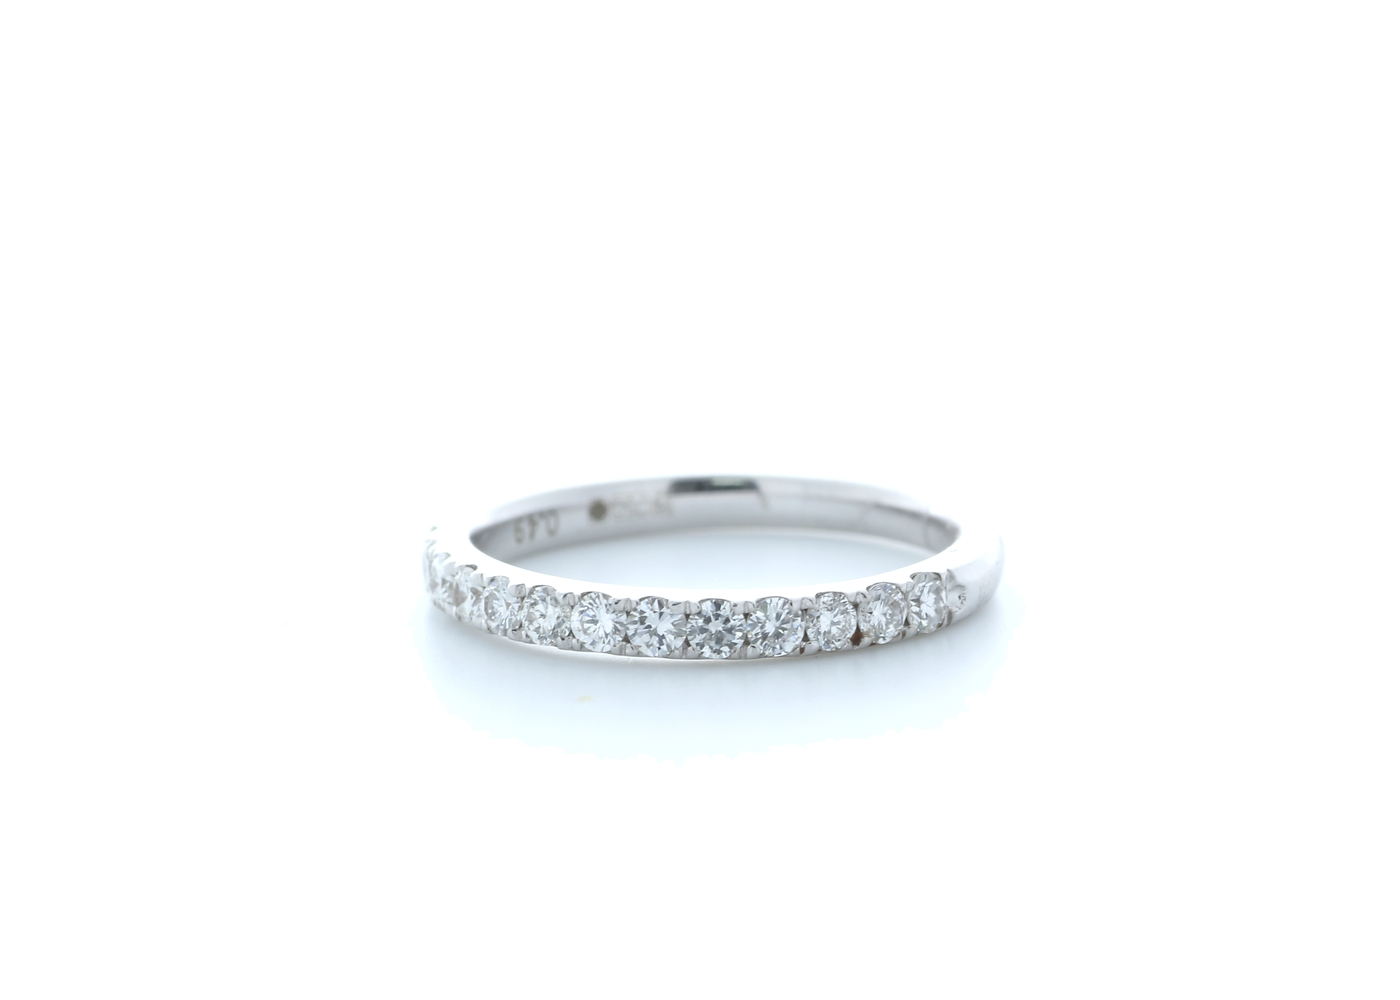 18ct White Gold Claw Set Semi Eternity Diamond Ring 0.17 Carats - Image 2 of 4